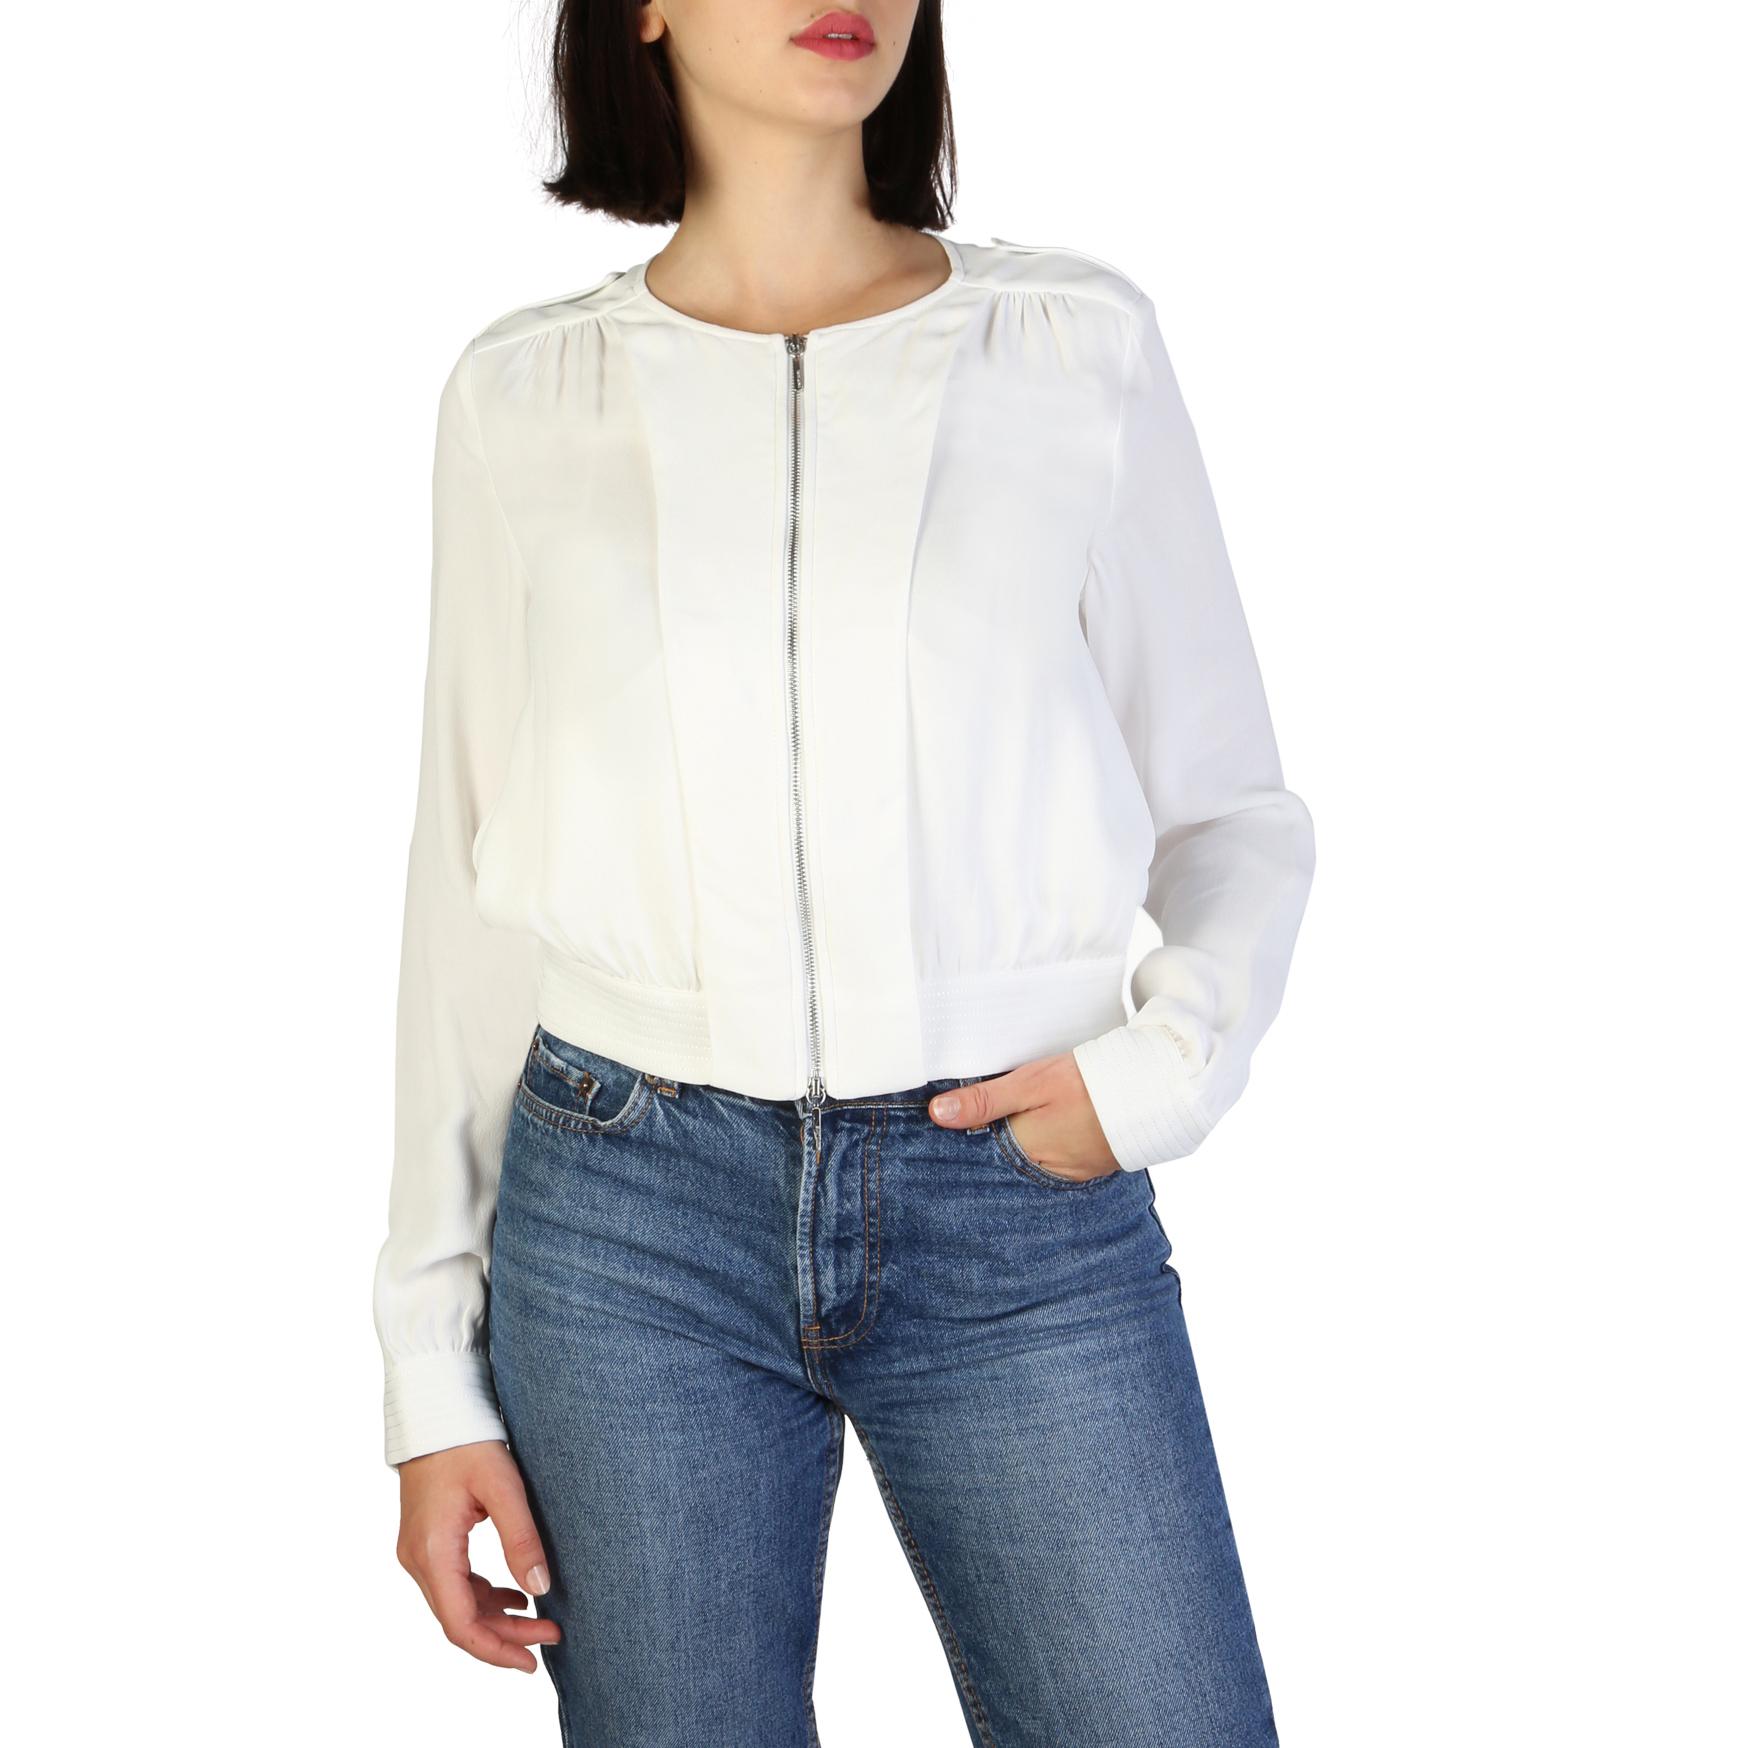 Armani Jeans 3Y5B54_5NYFZ Donna Bianco 107798Armani Jeans